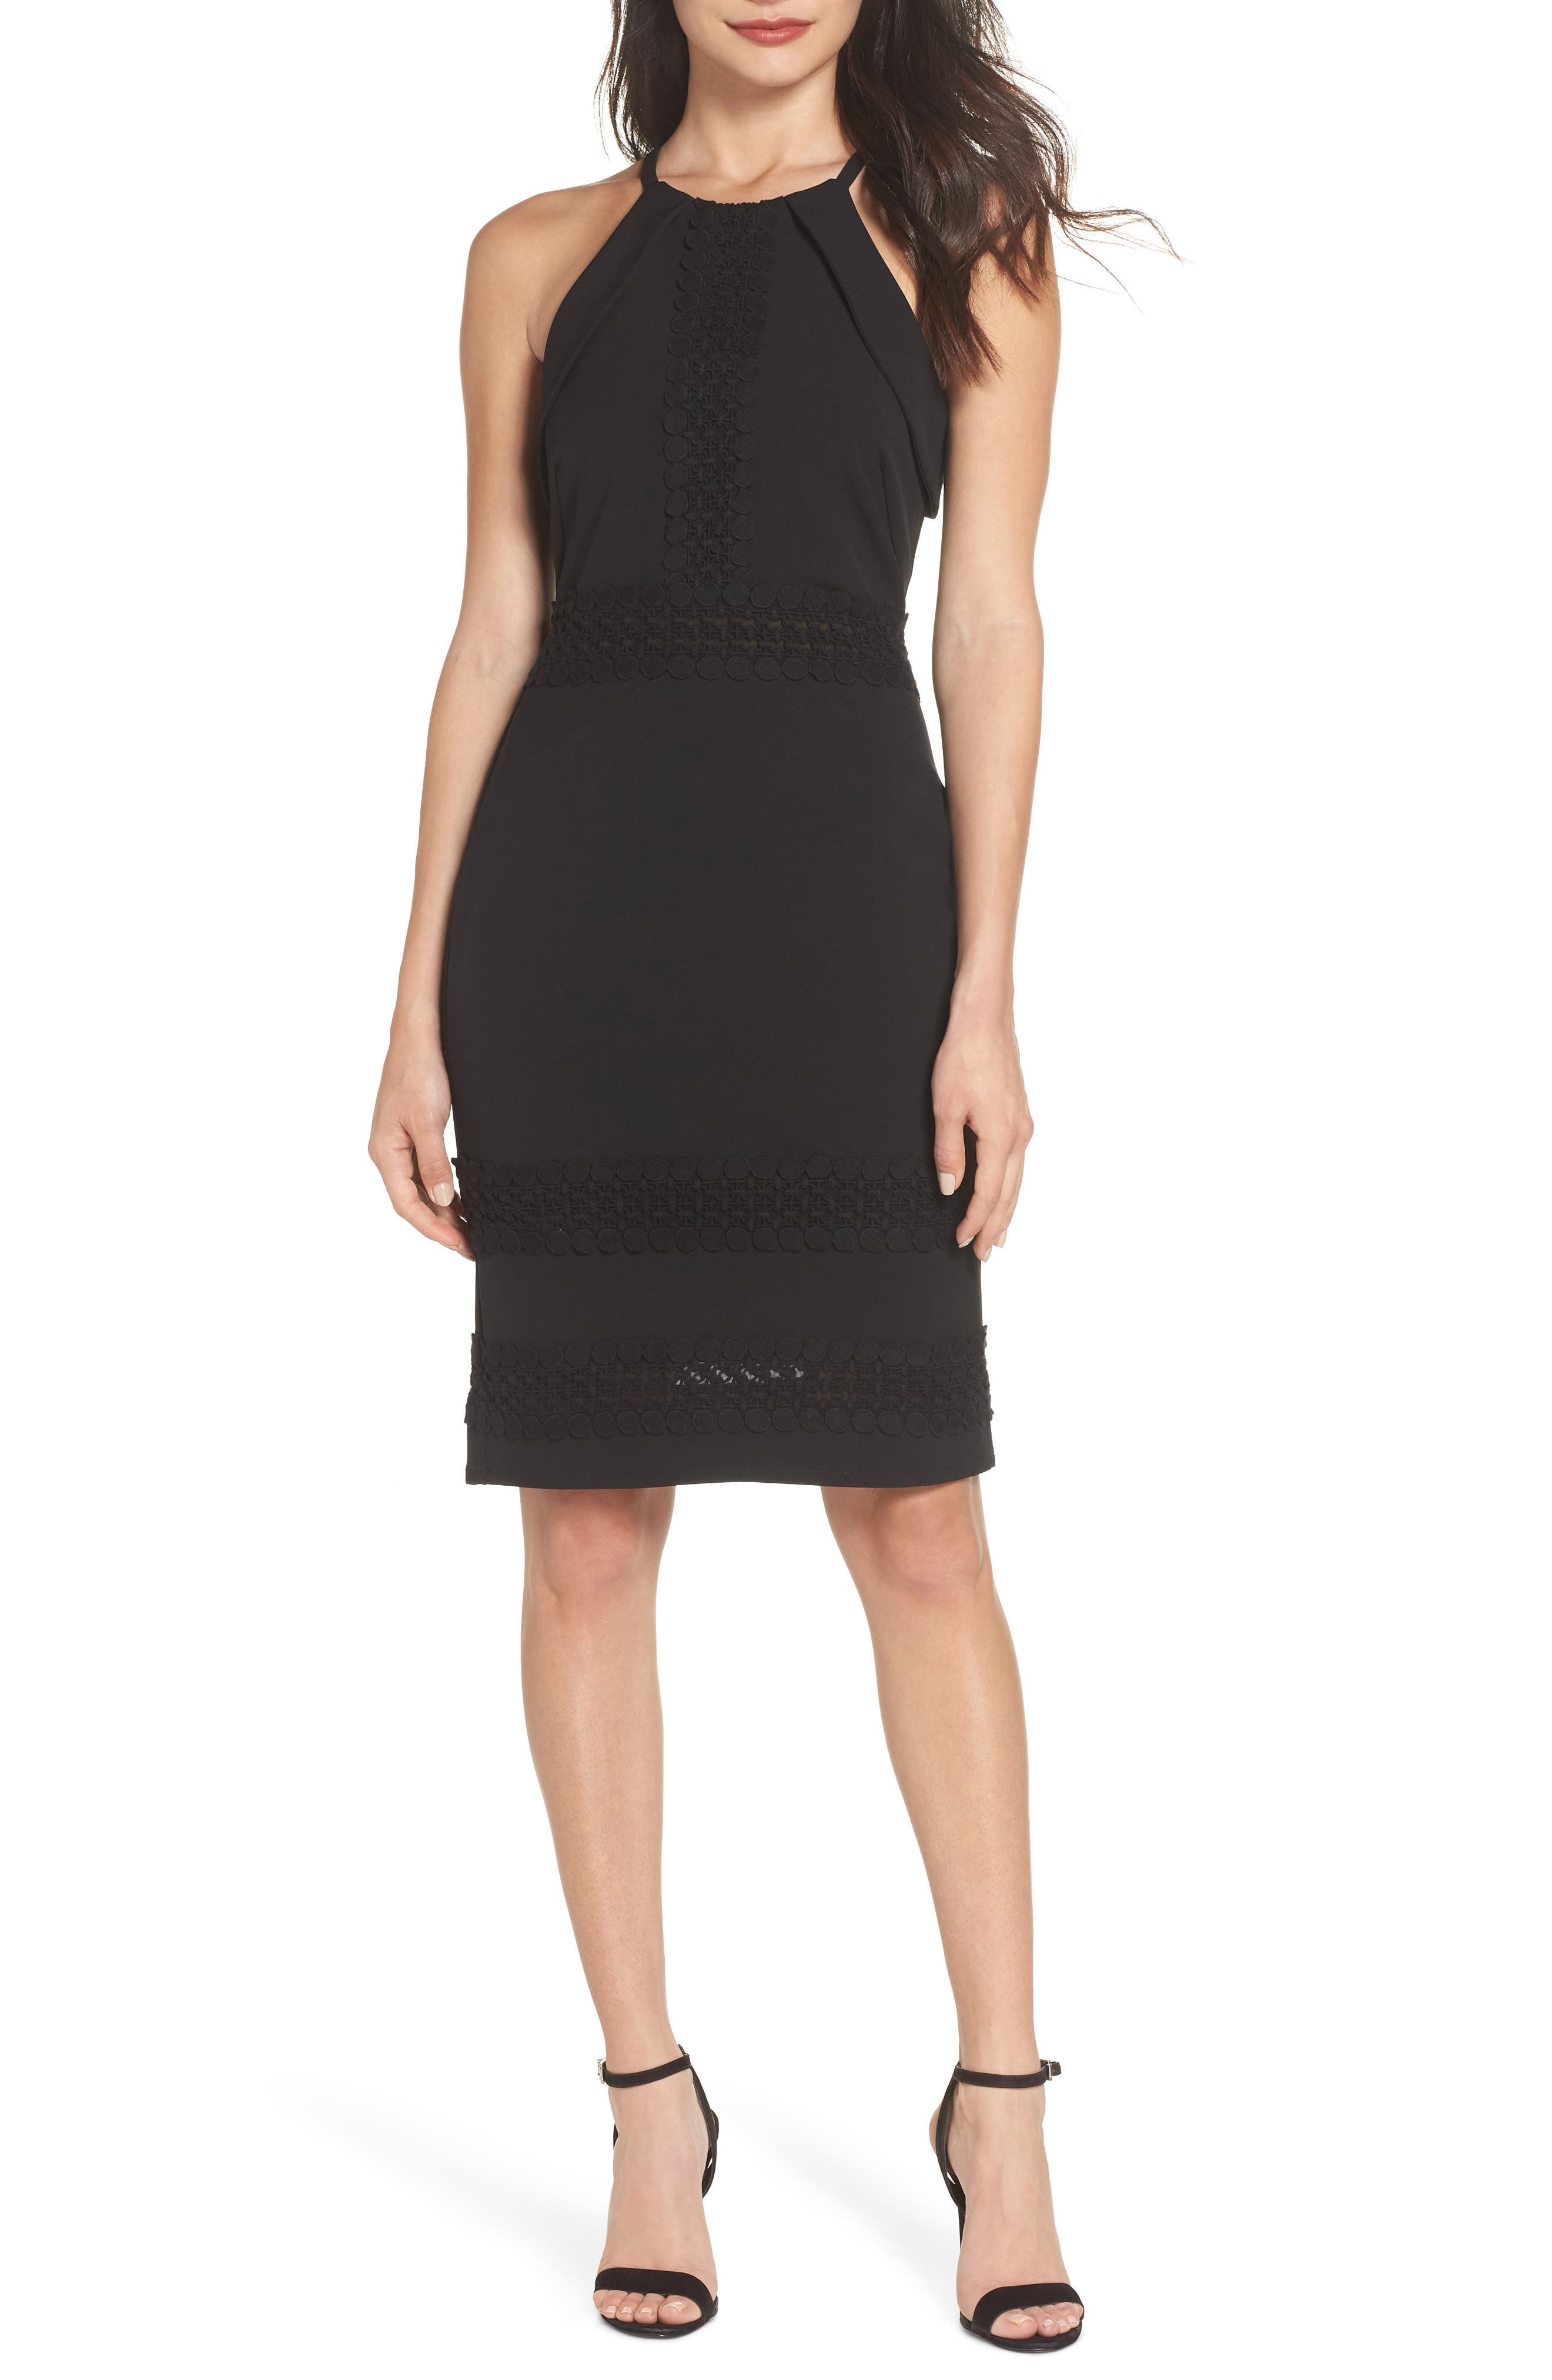 ADELYN RAE Daveena Halter Dress in Black